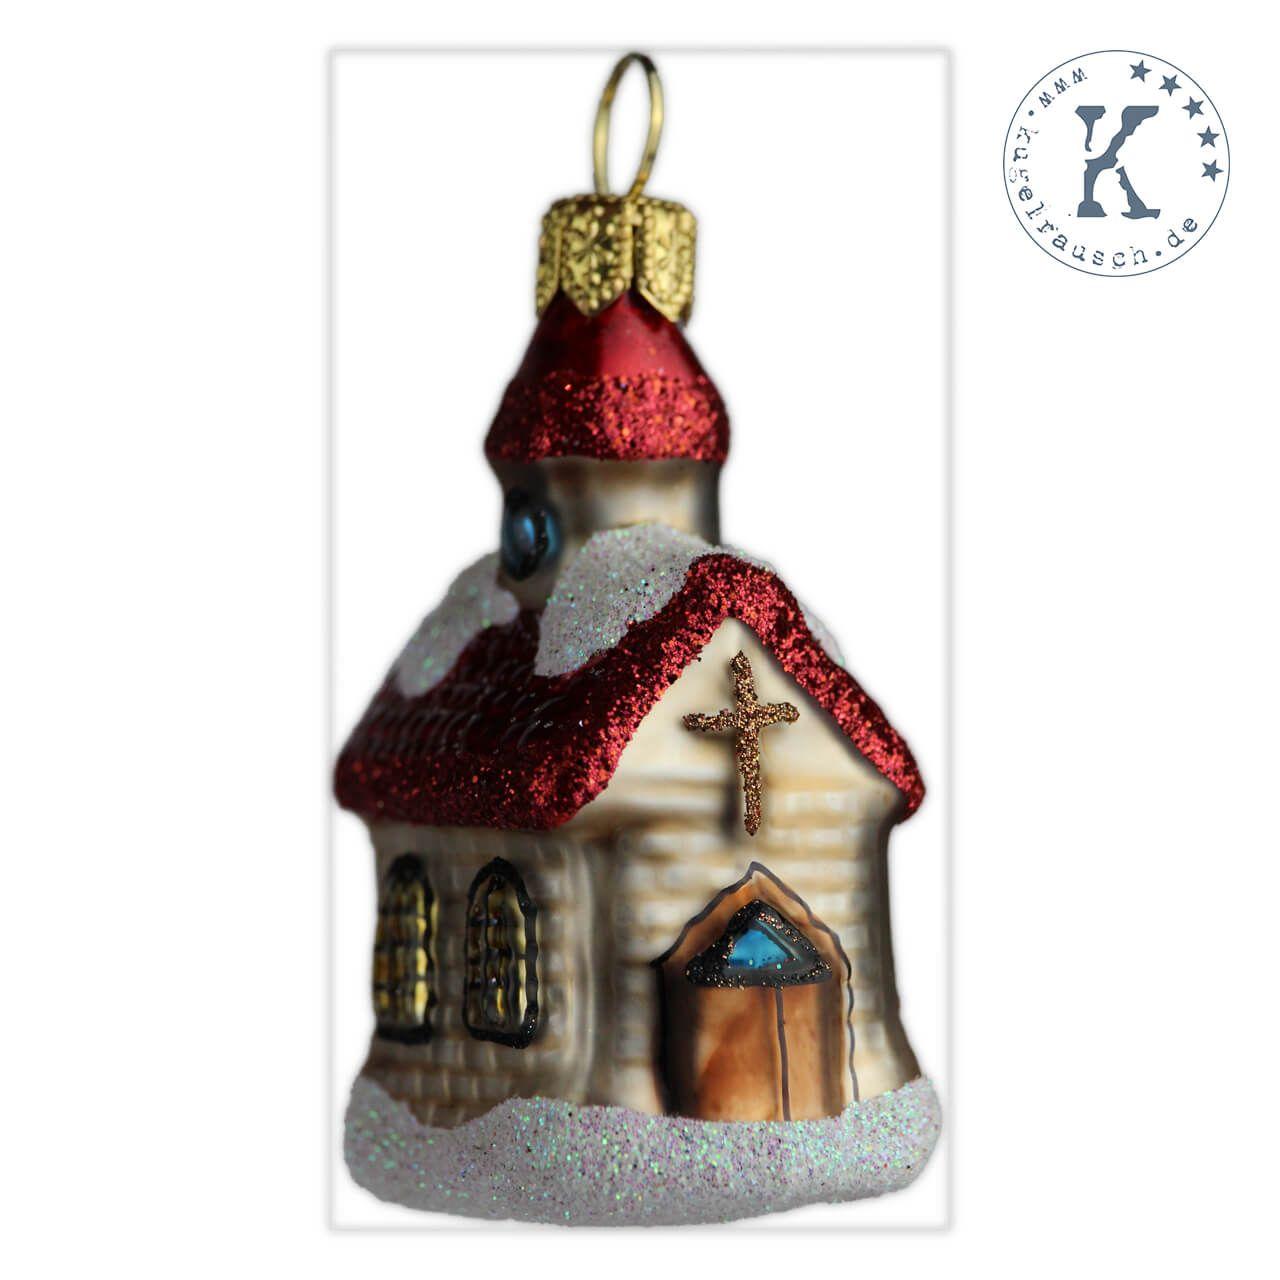 Christbaumkugeln Feuerwehr.Christbaumkugel Kirche Mini Weihnachtskugeln Christbaumkugeln